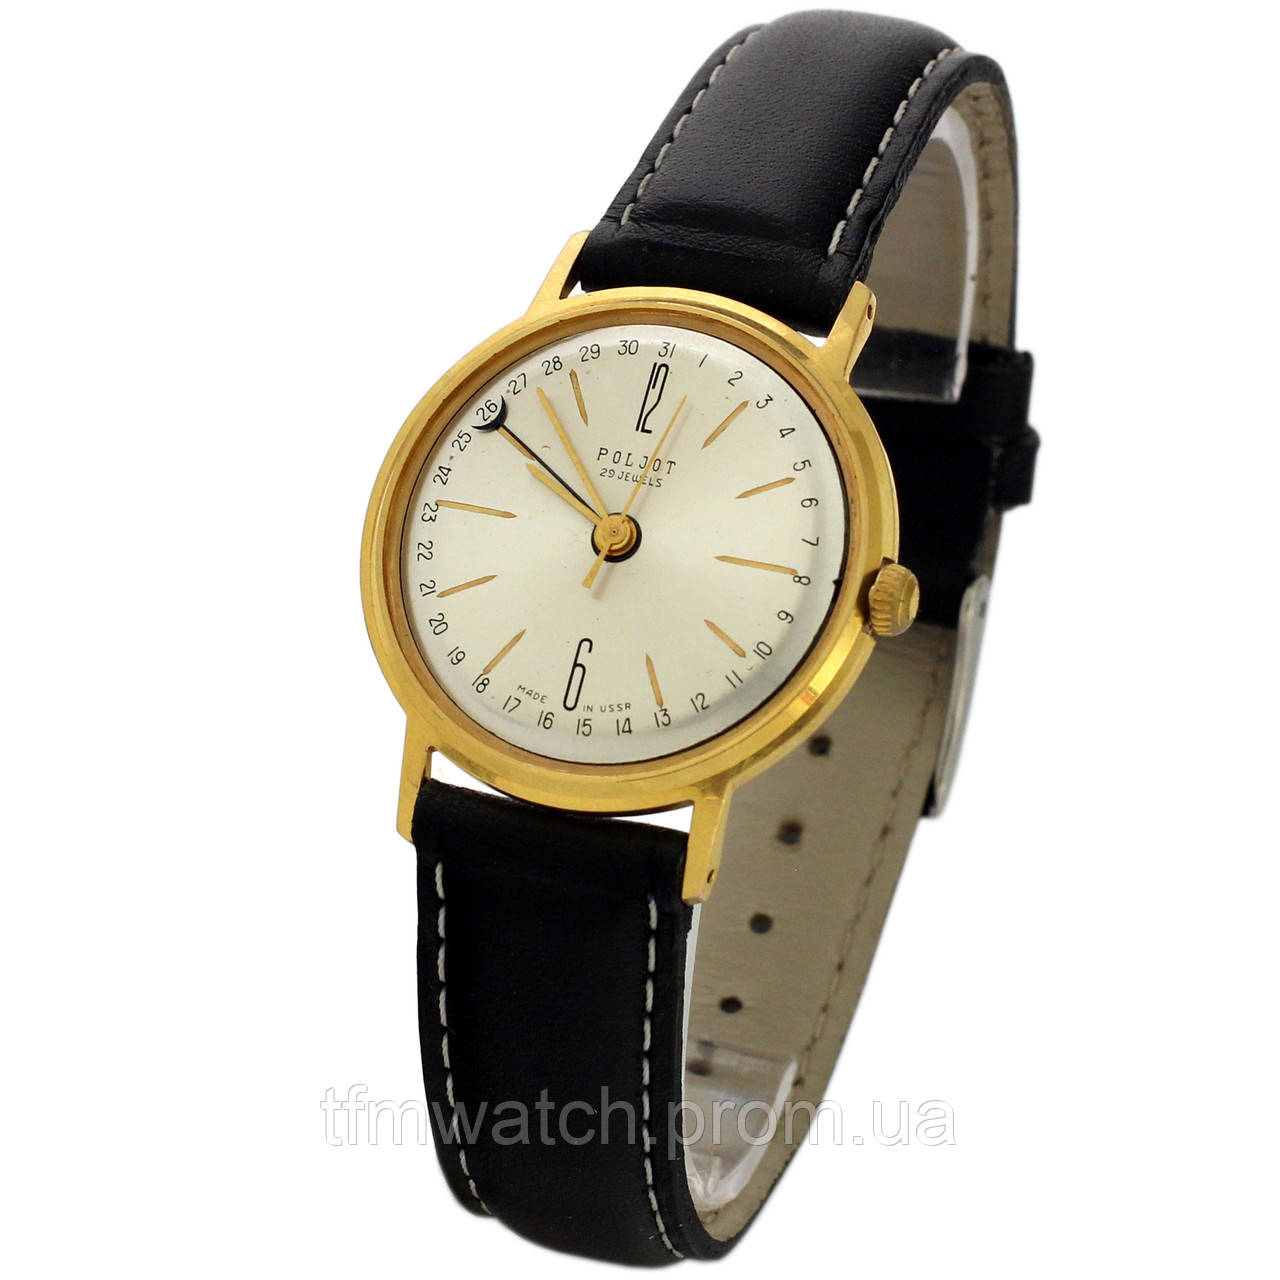 Stainless steel back стоимость часов стоимость часы wellington